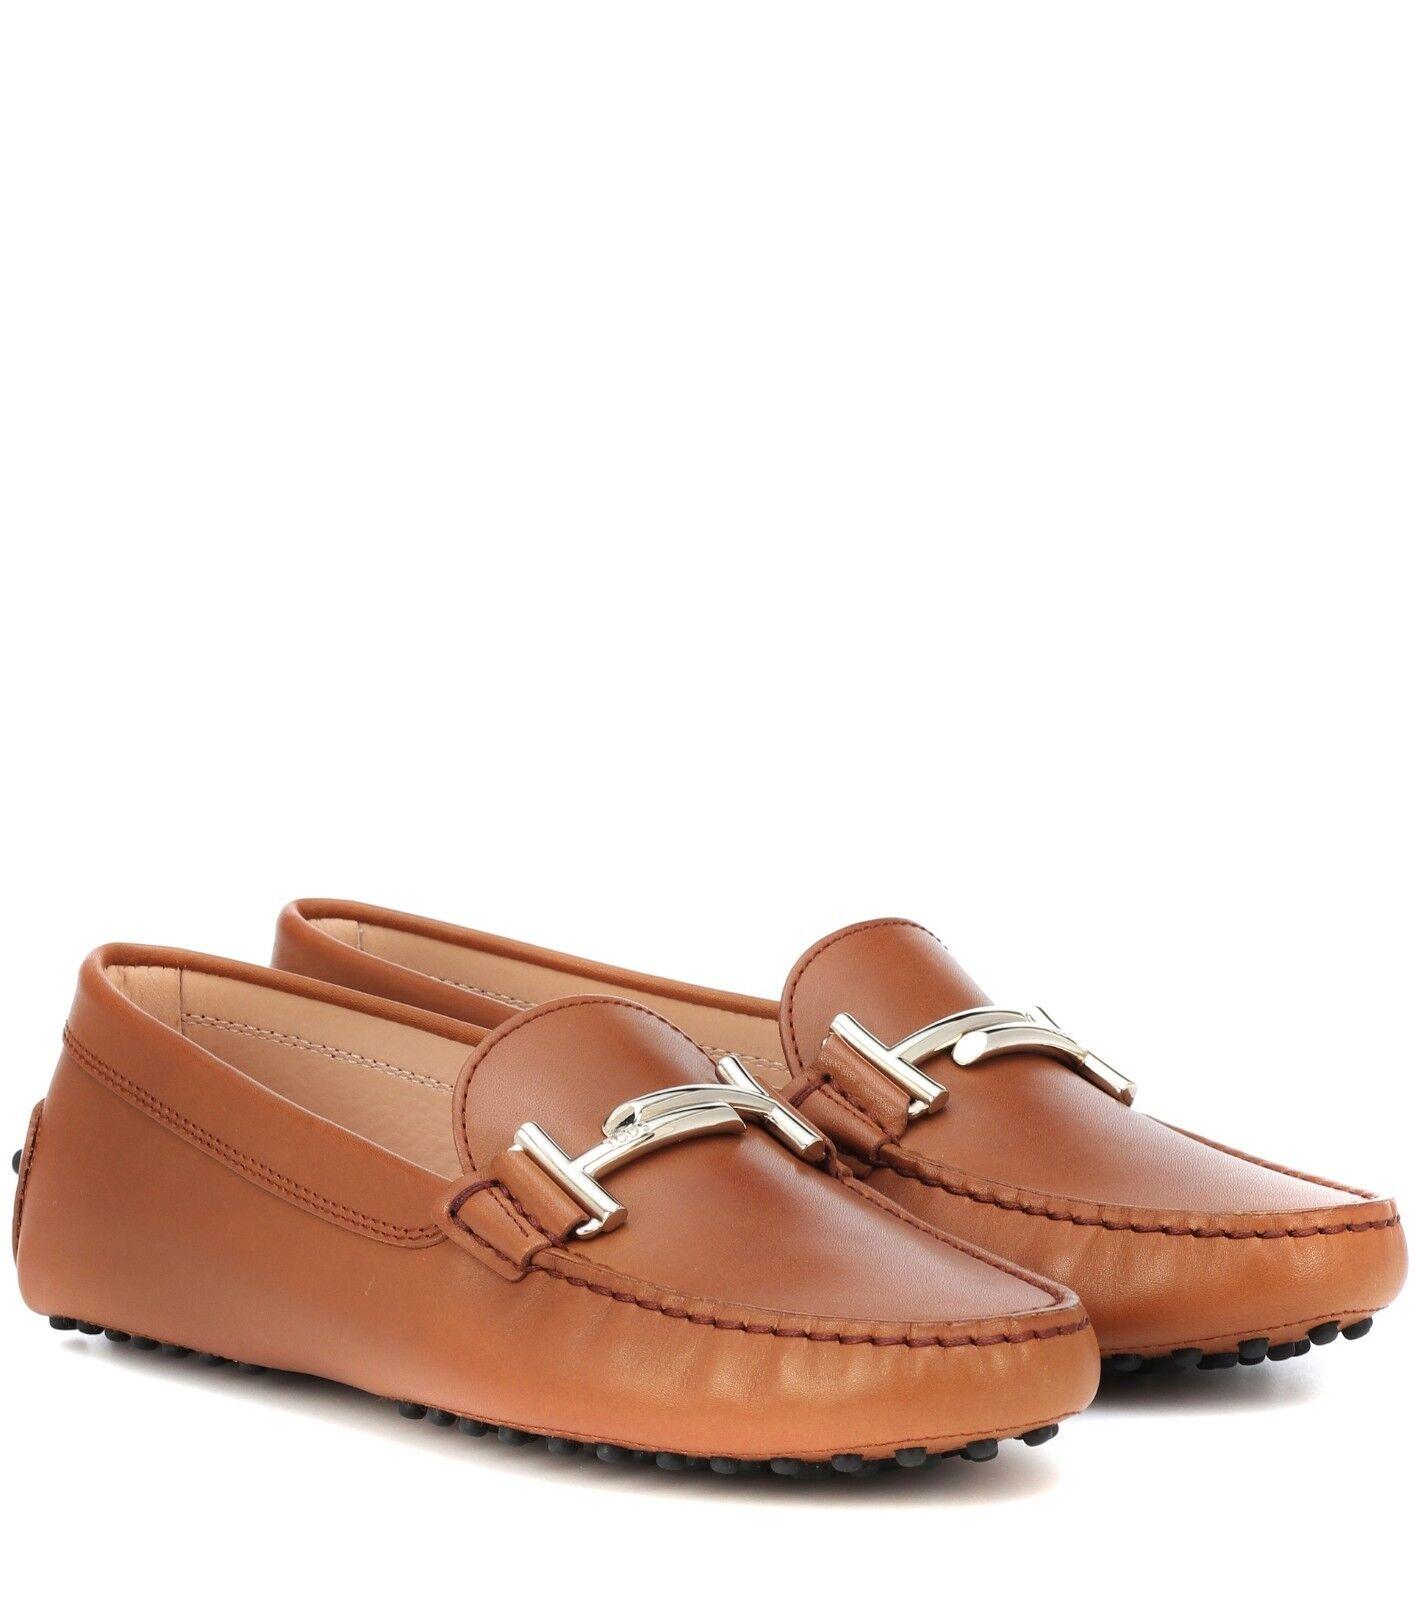 TOD'S gommino 625 double T 625 gommino woman Scarpe 여성용 loafers женская обувь ... 427174